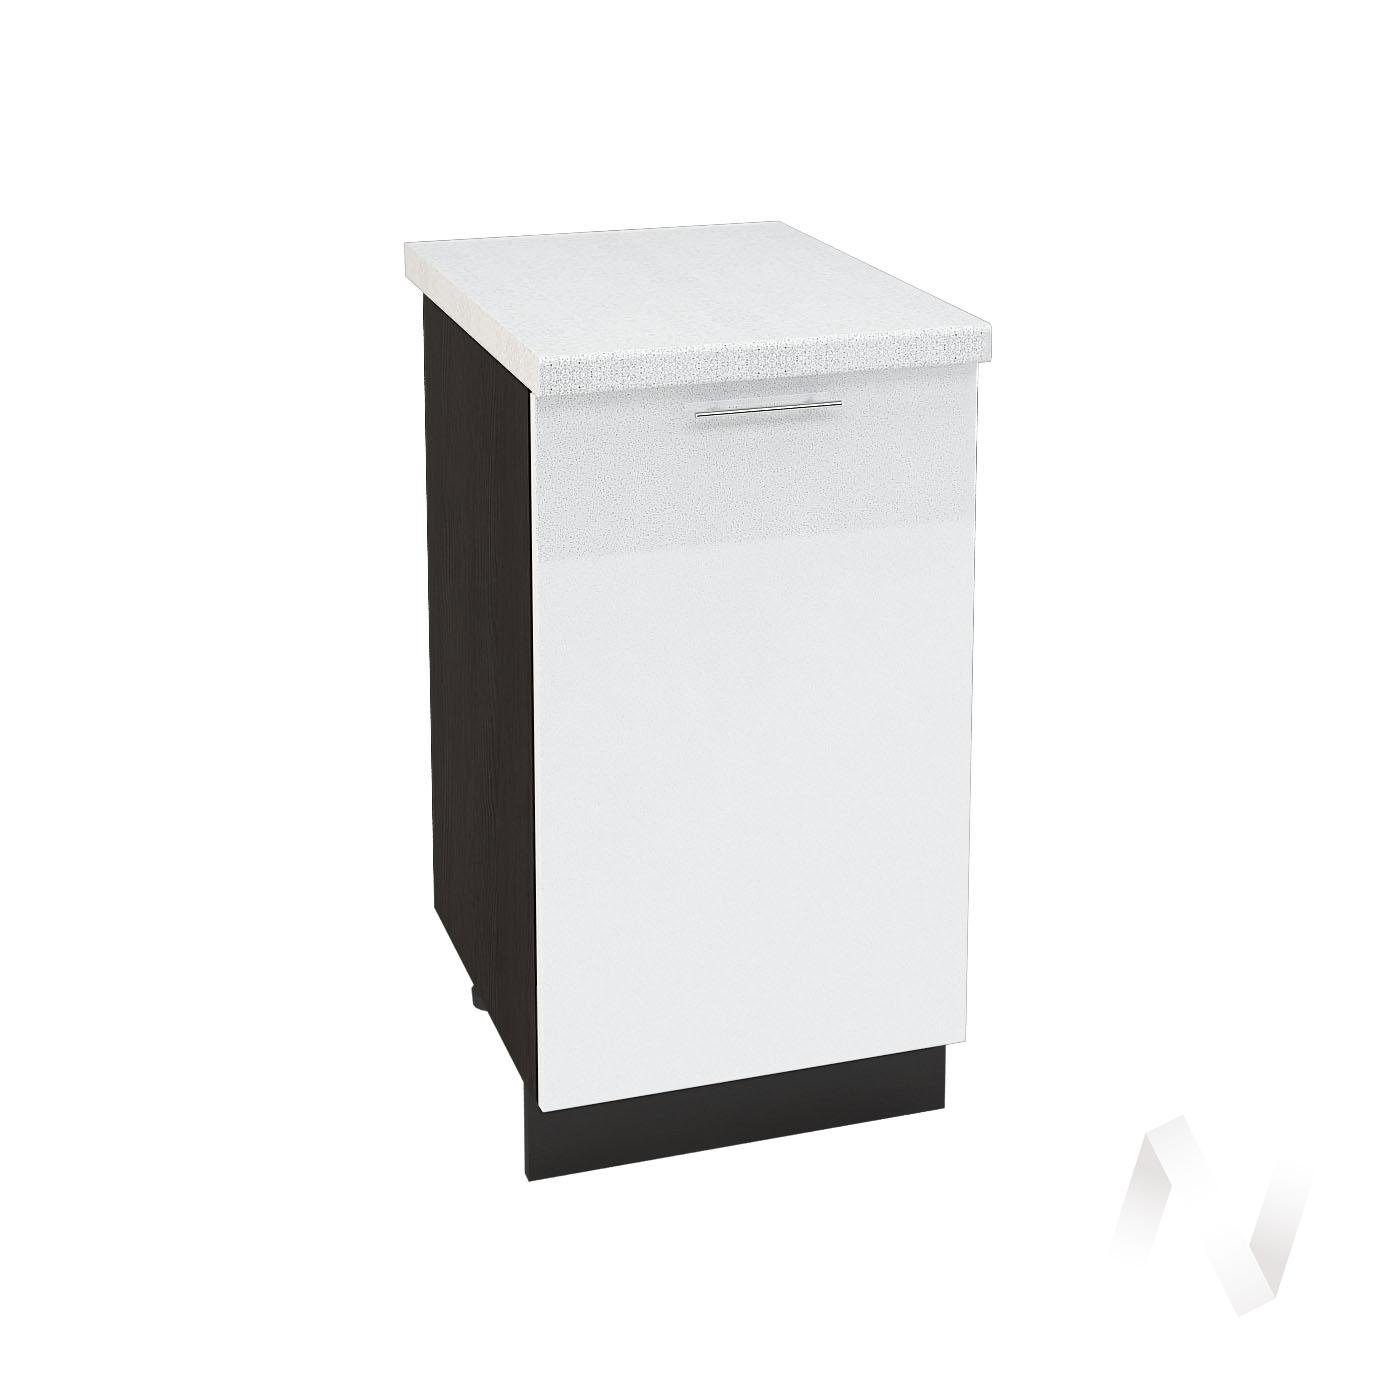 "Кухня ""Валерия-М"": Шкаф нижний 450, ШН 450 (белый глянец/корпус венге)"